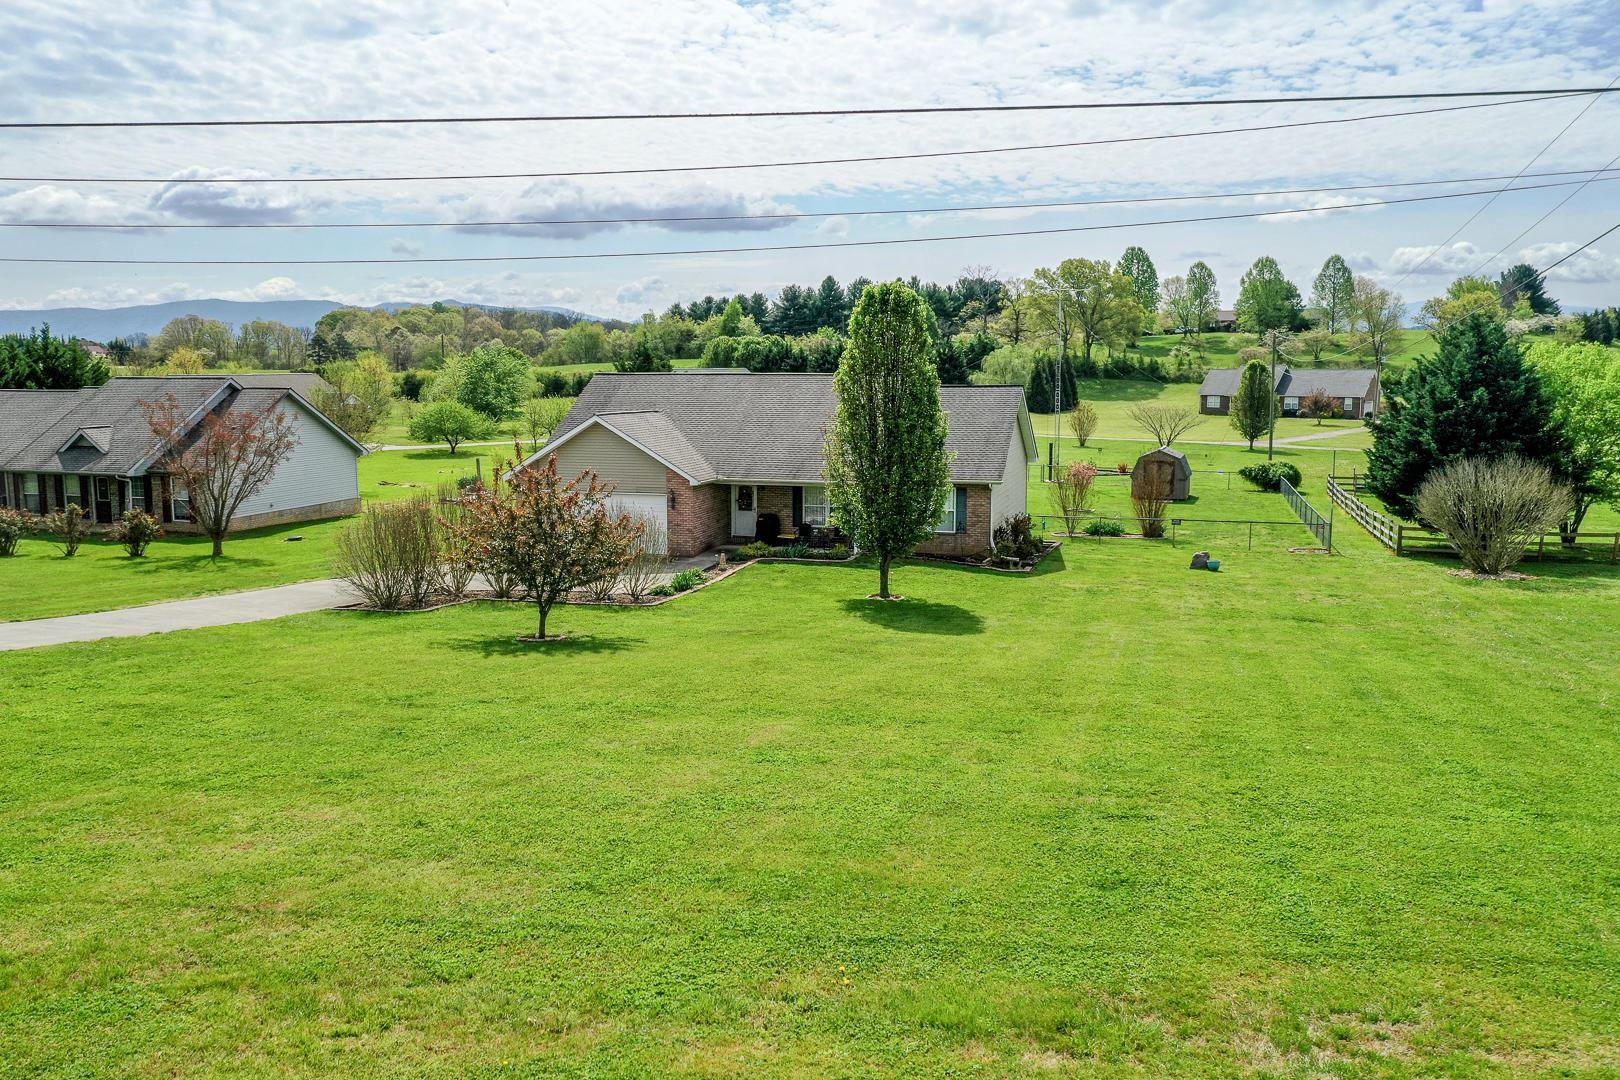 Photo of 6626 Howard School Rd, Maryville, TN 37801 (MLS # 1149478)